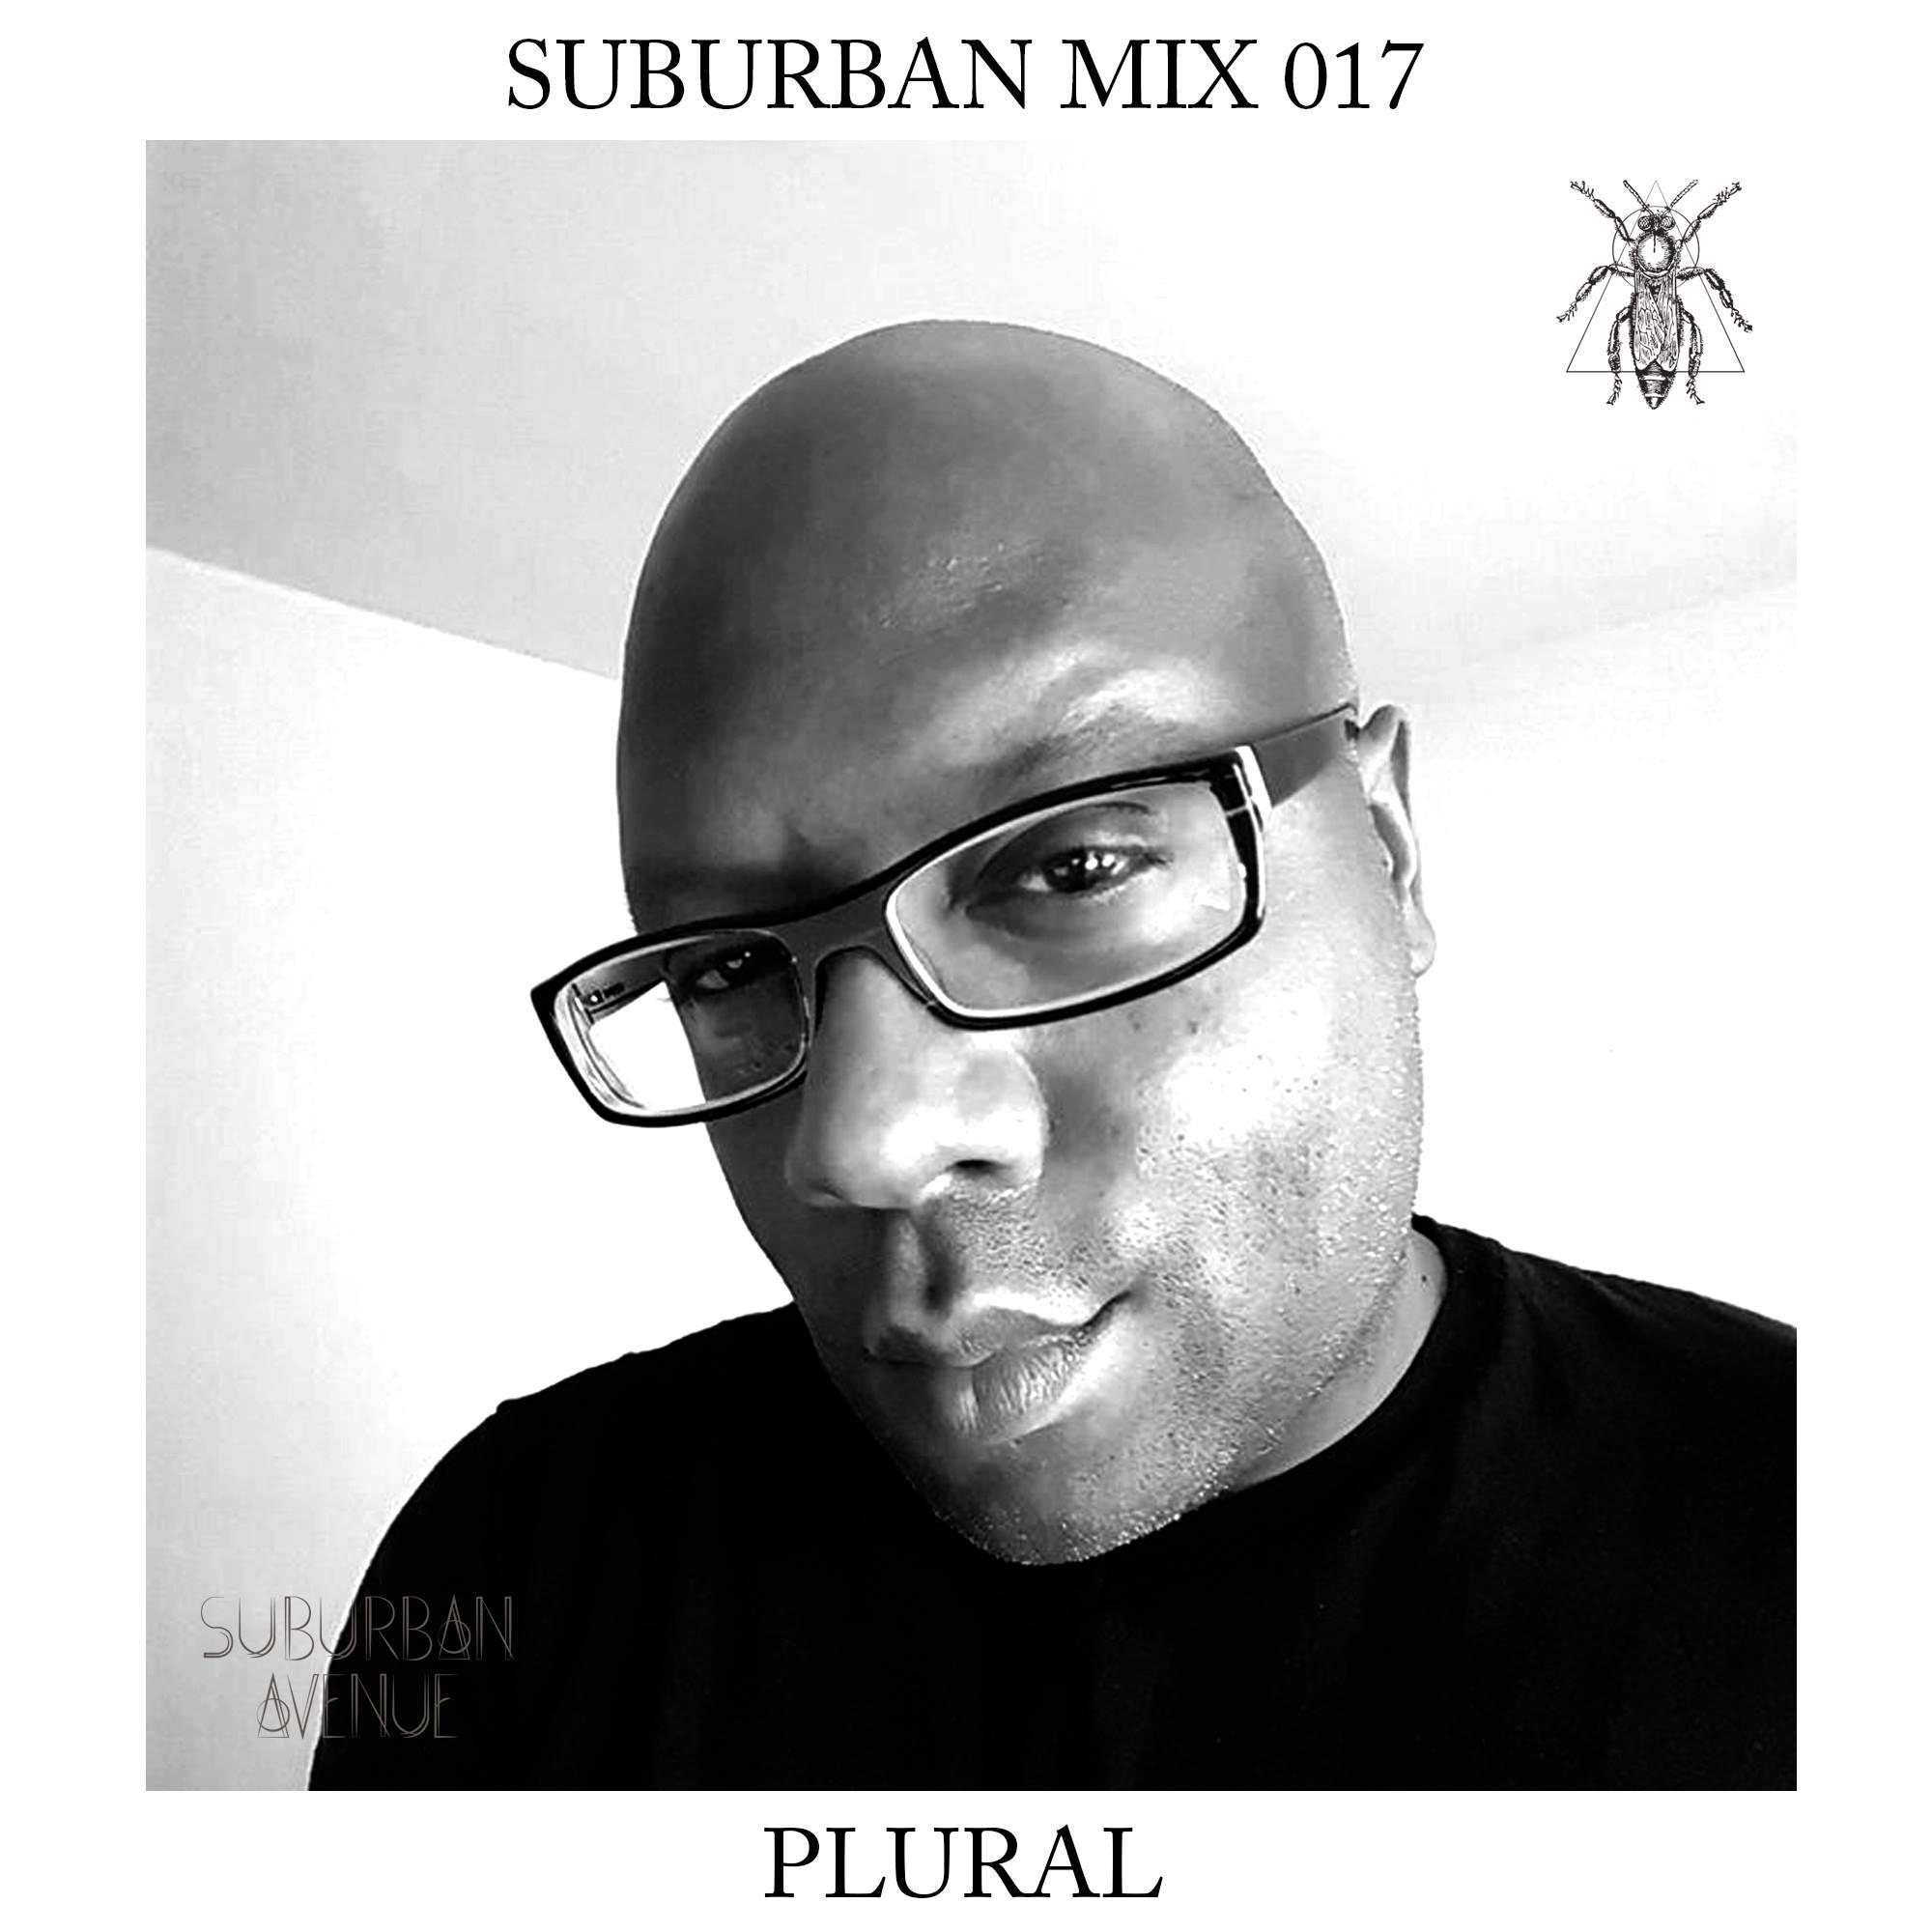 Suburban Mix 017 - Plural